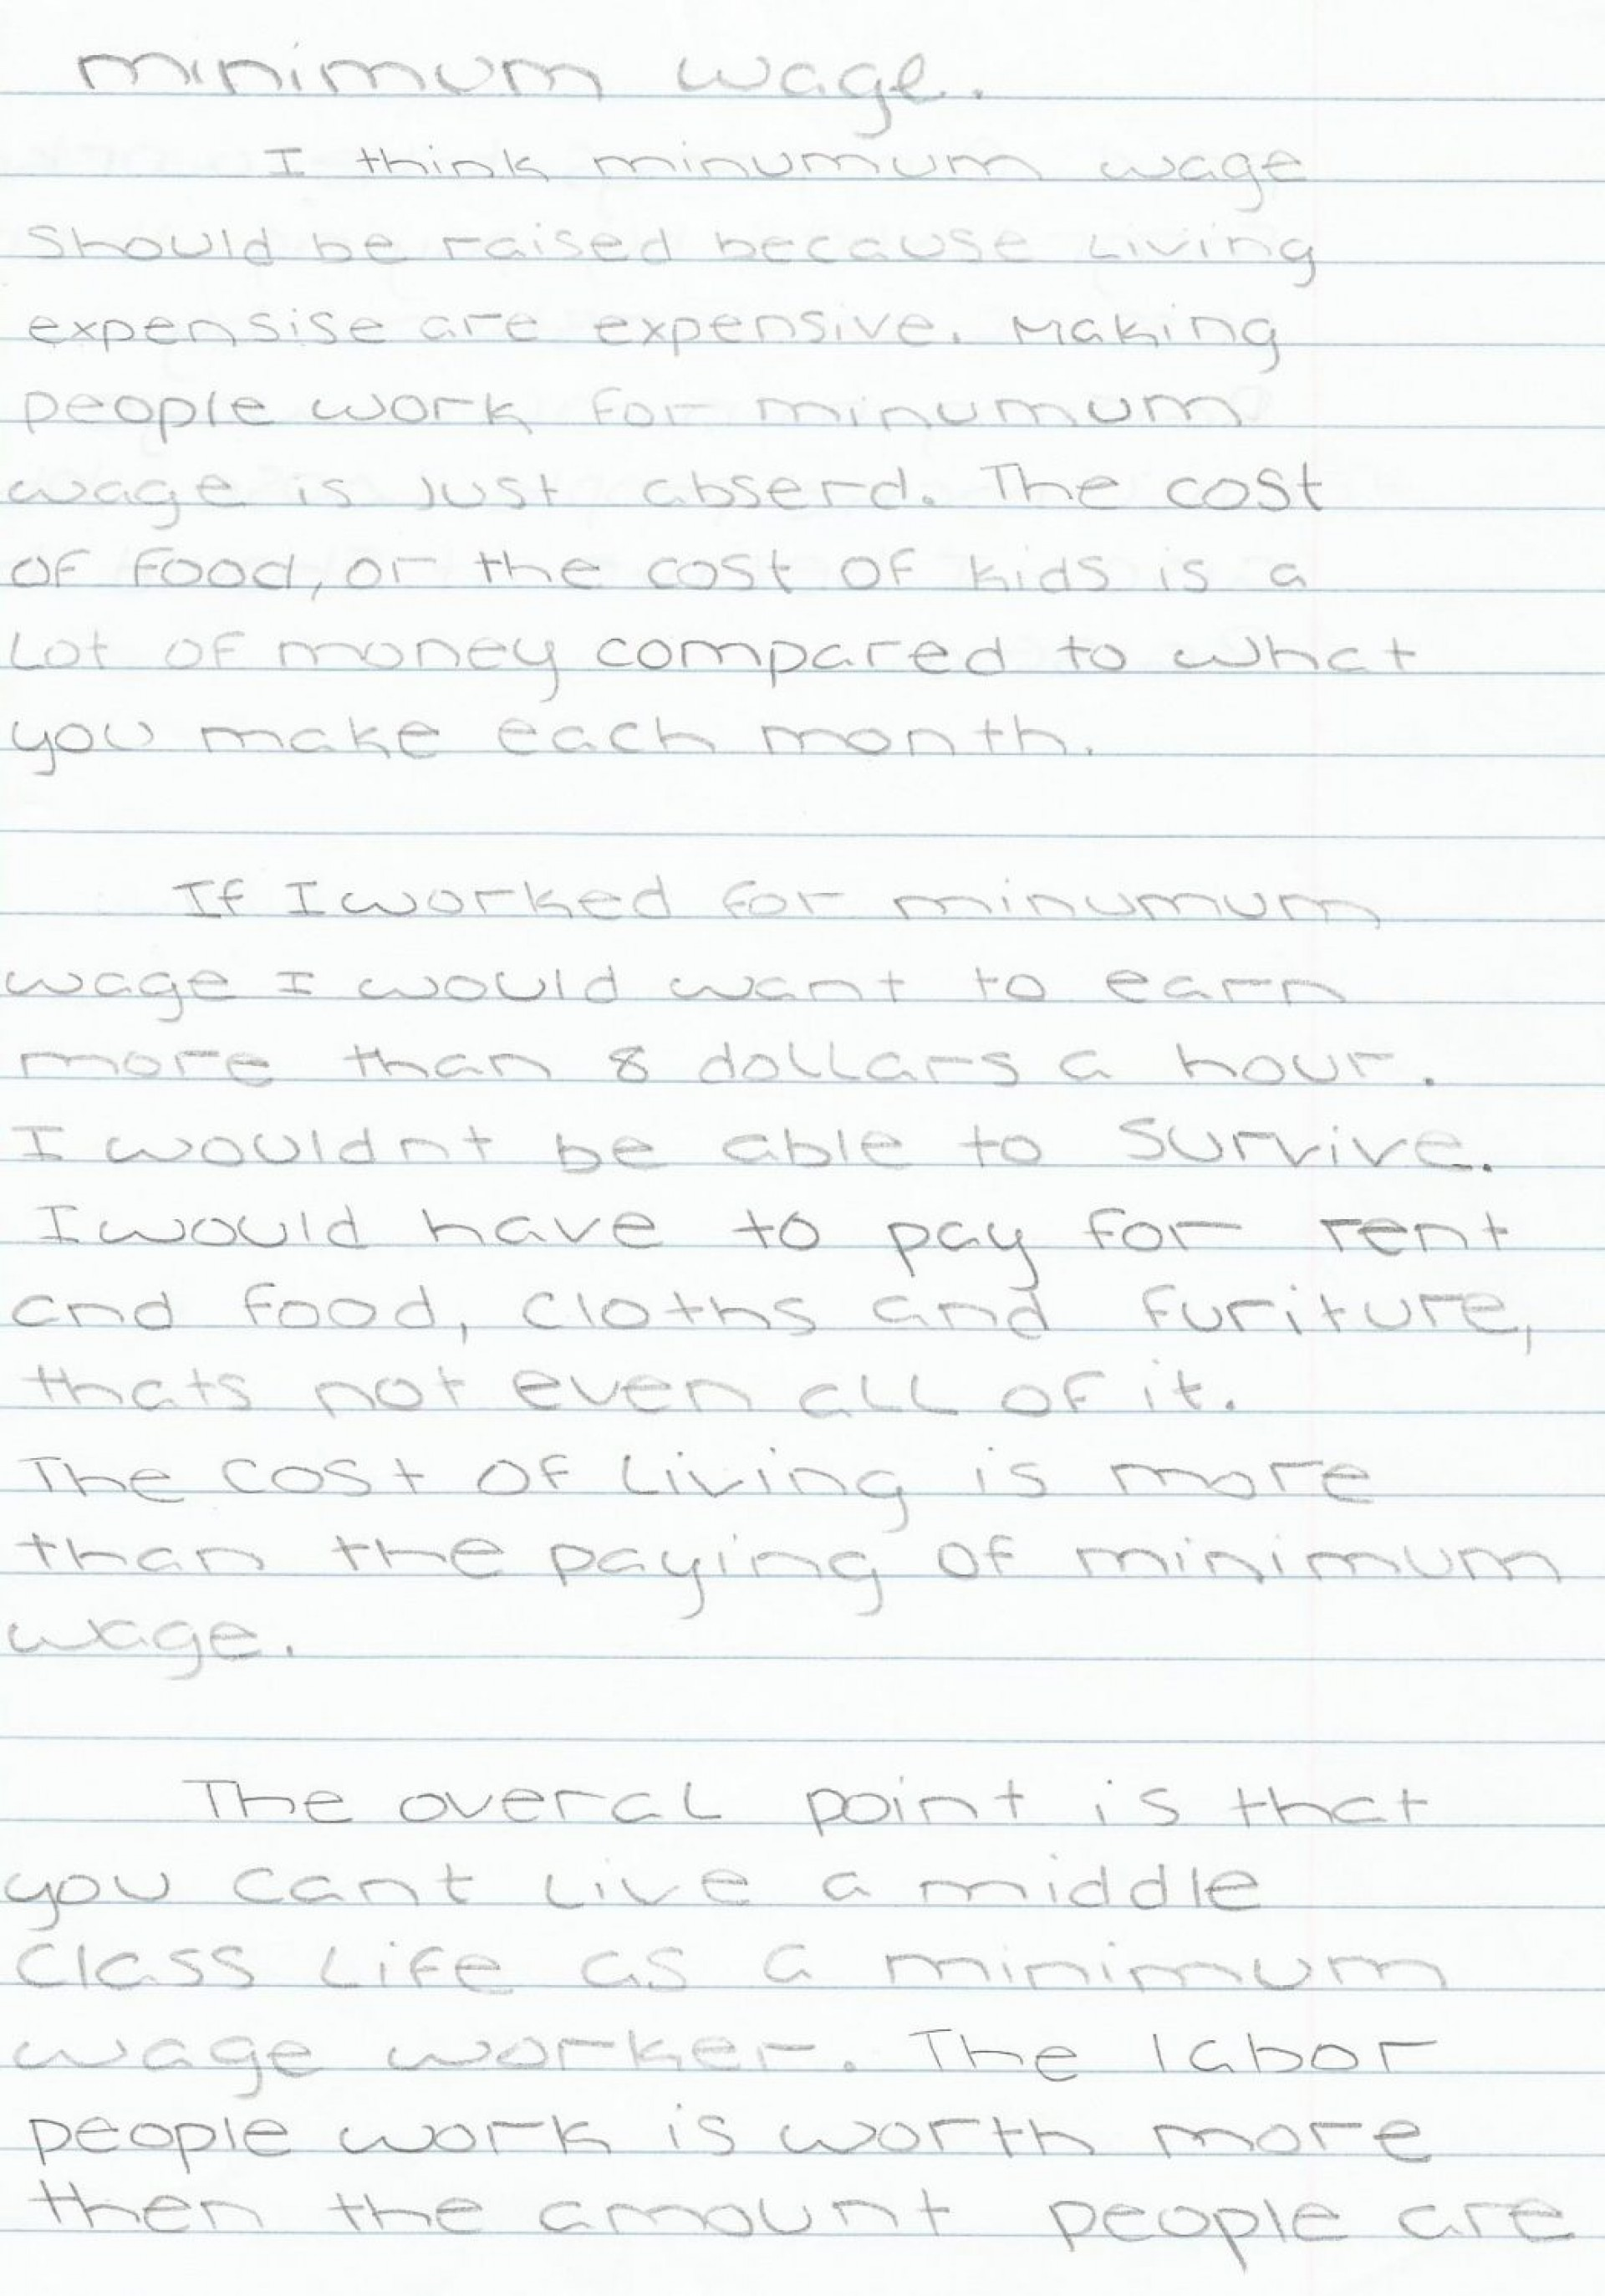 002 Essay Example On Minimum Wage Should Raised Write Schola Increase Argumentative Raising Beautiful Free 1920